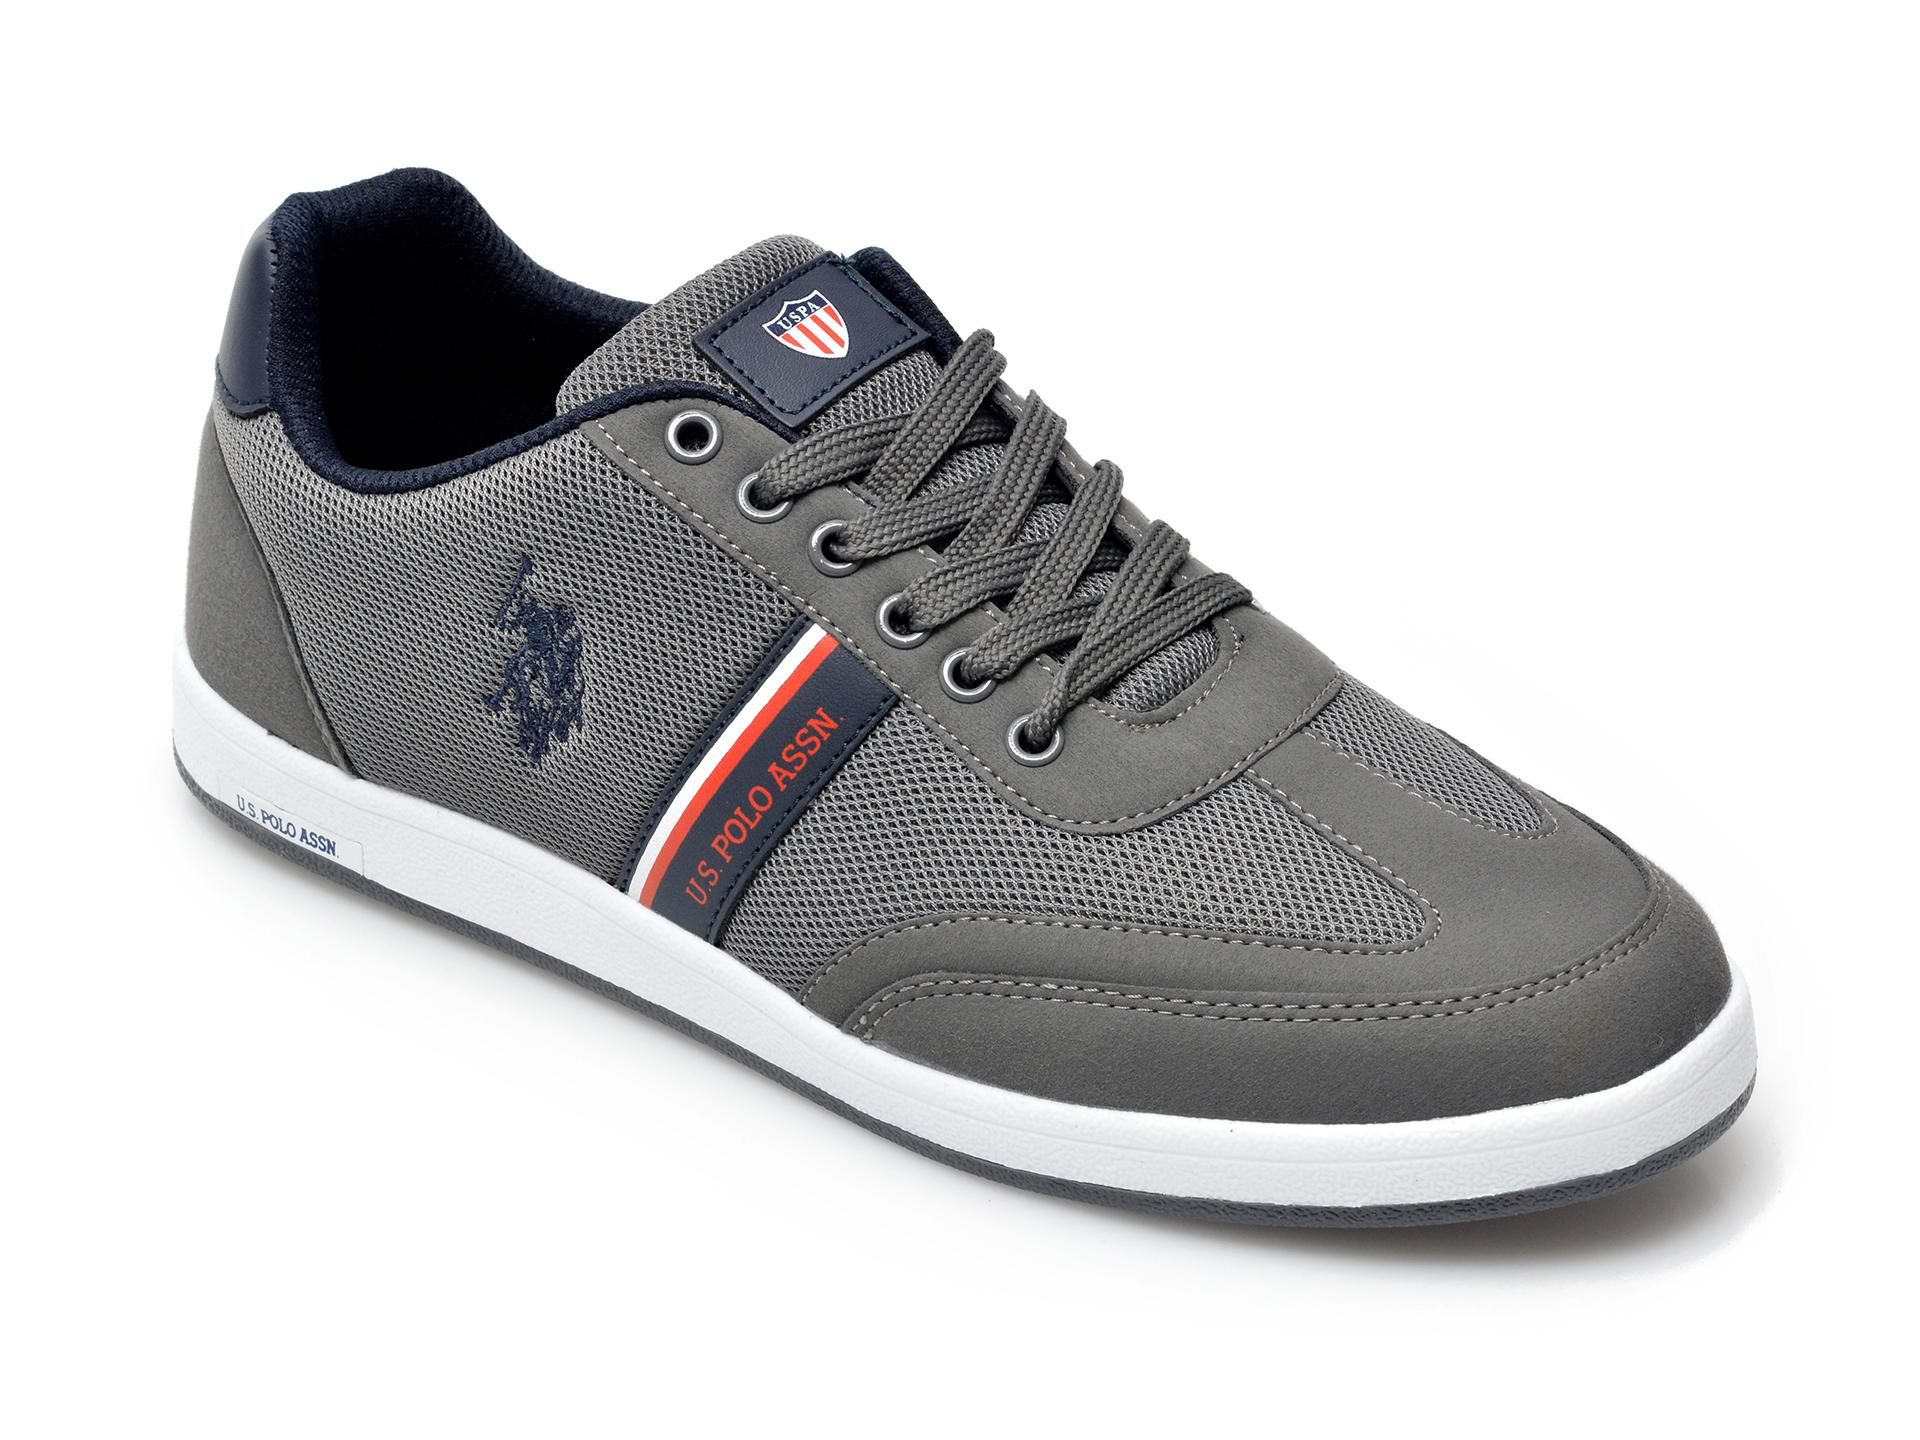 Pantofi sport US POLO ASSN gri, KARE1FX, din material textil si piele ecologica imagine otter.ro 2021